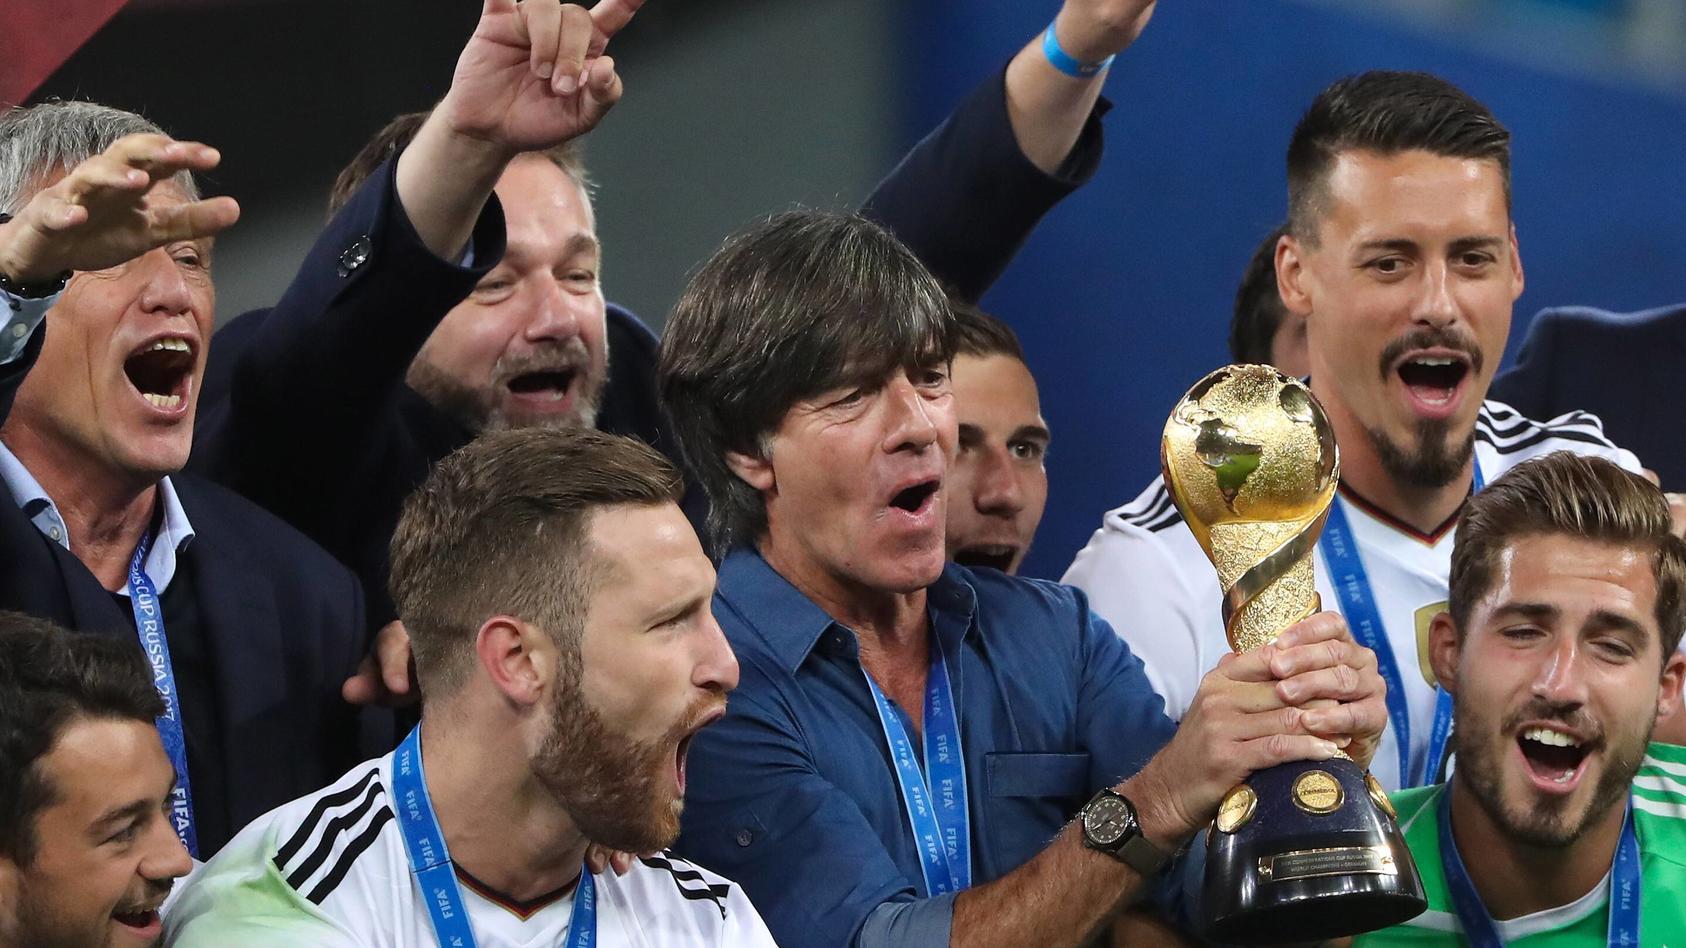 Da ist das Ding: Joachim Löw feiert mit der Mannschaft den Triumph im Confed Cup